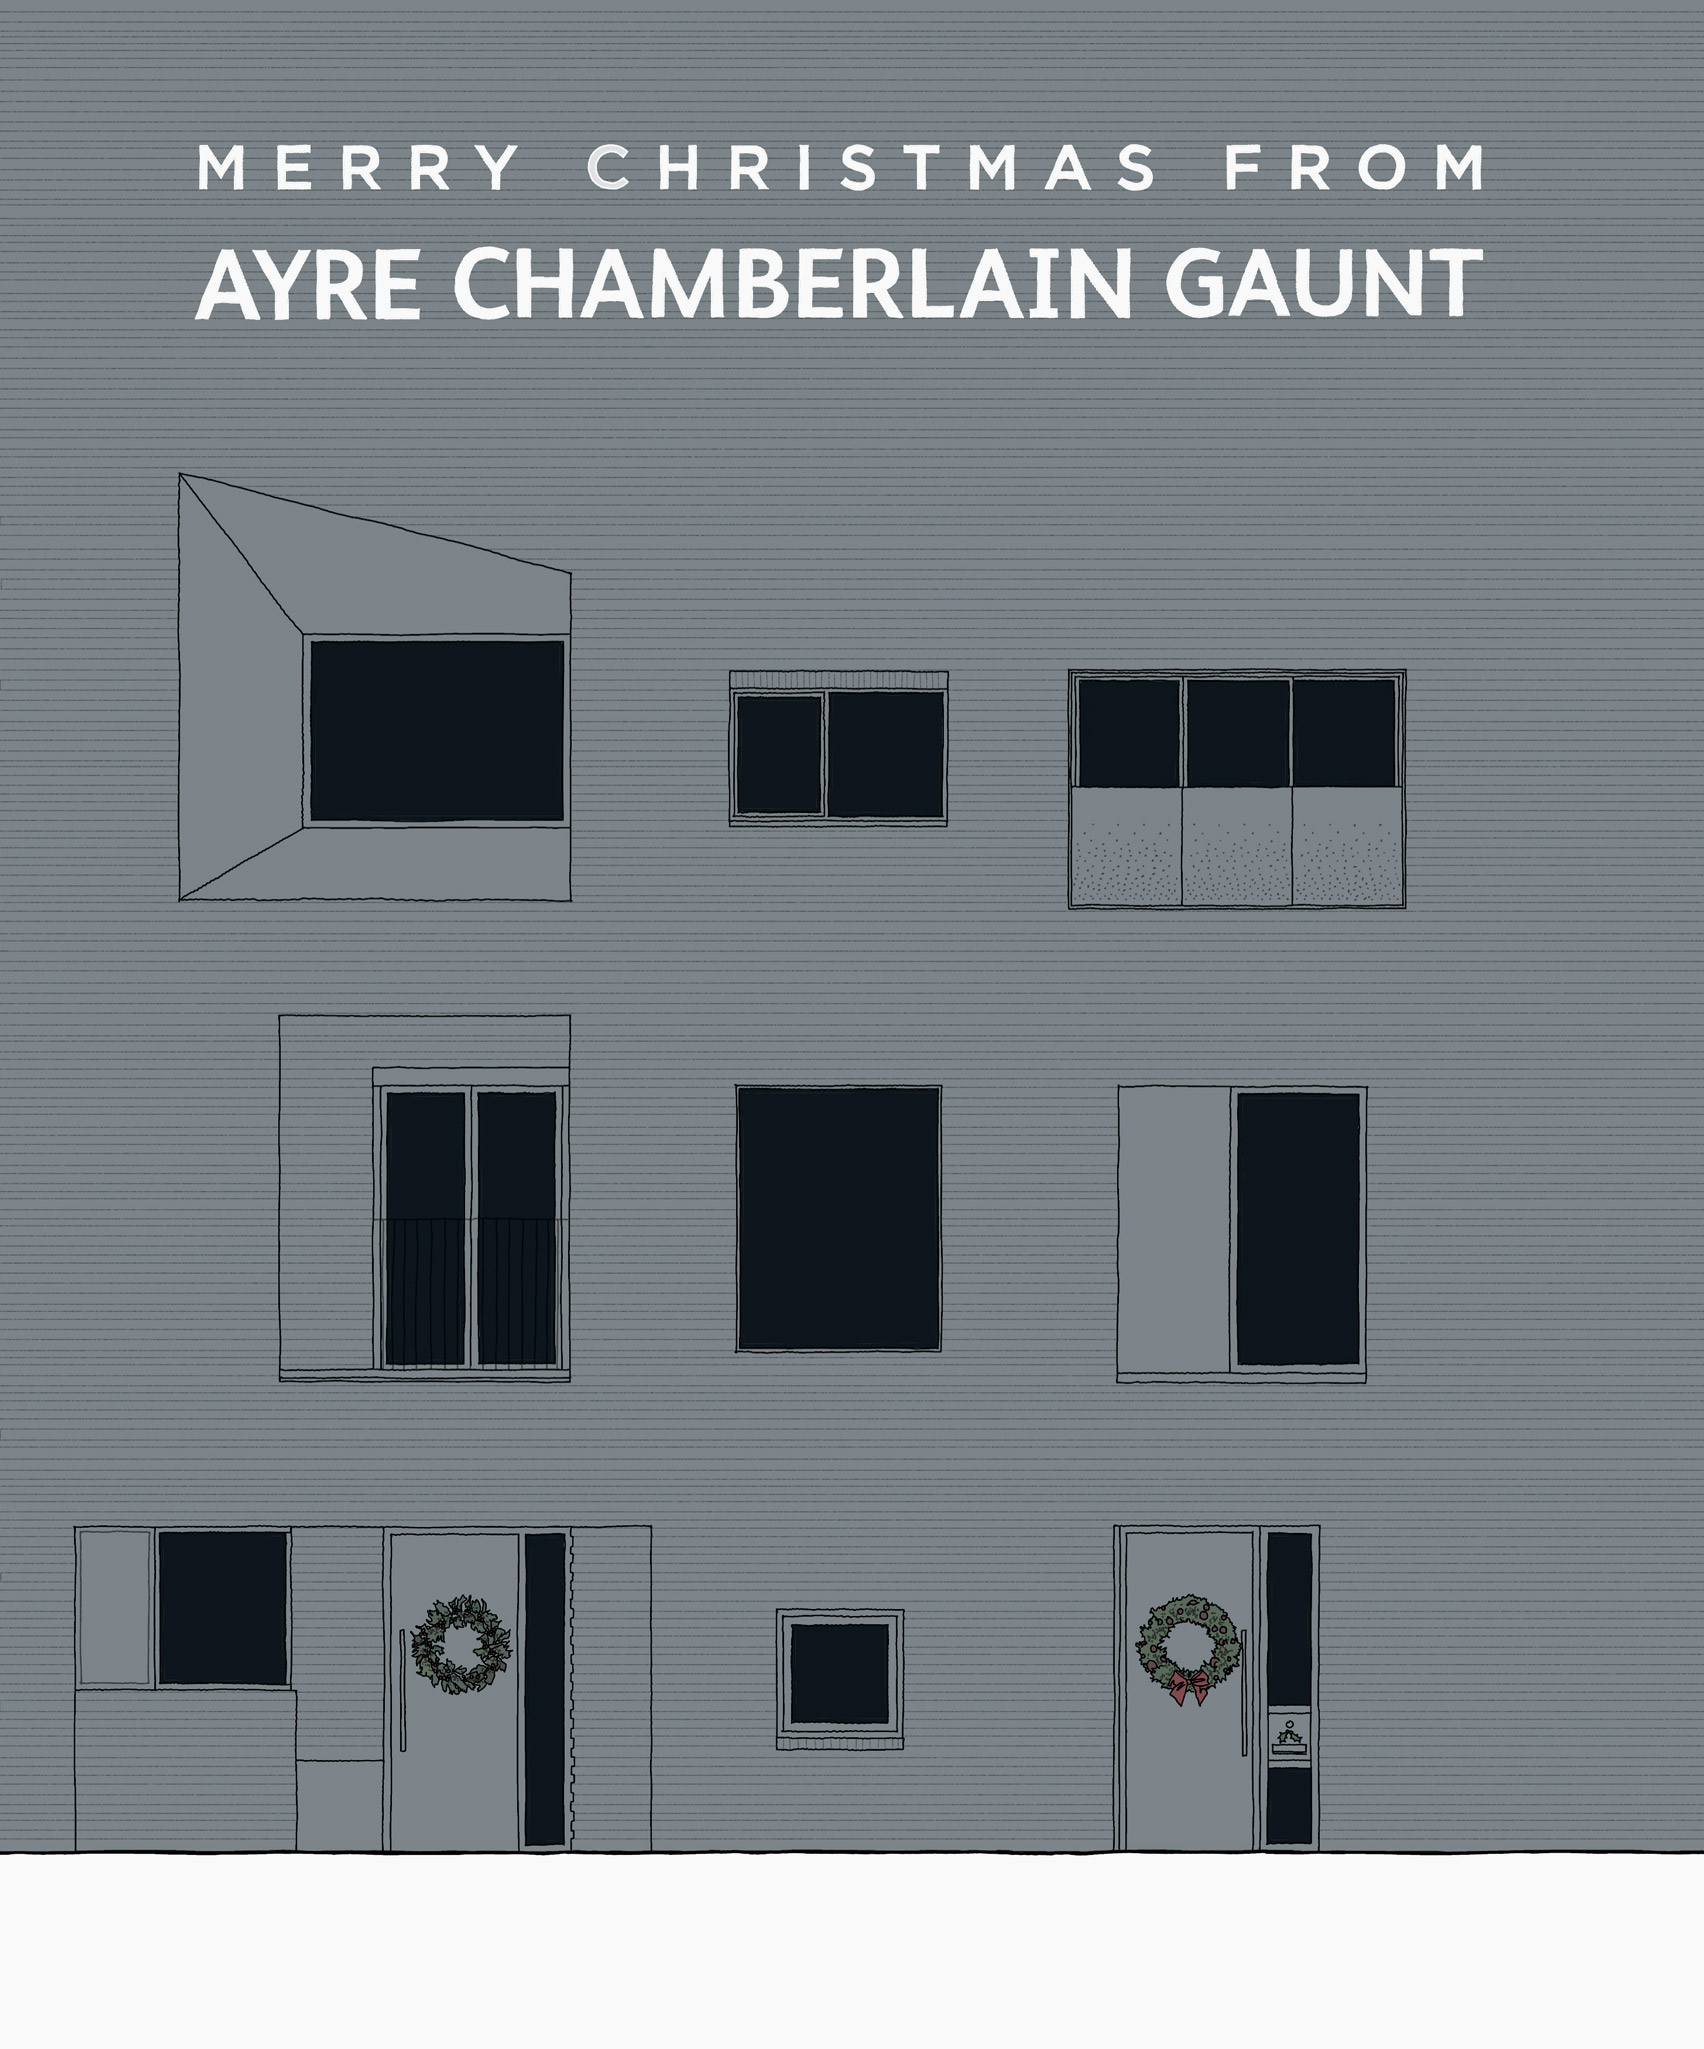 Christmas card by Ayre Chamberlain Gaunt